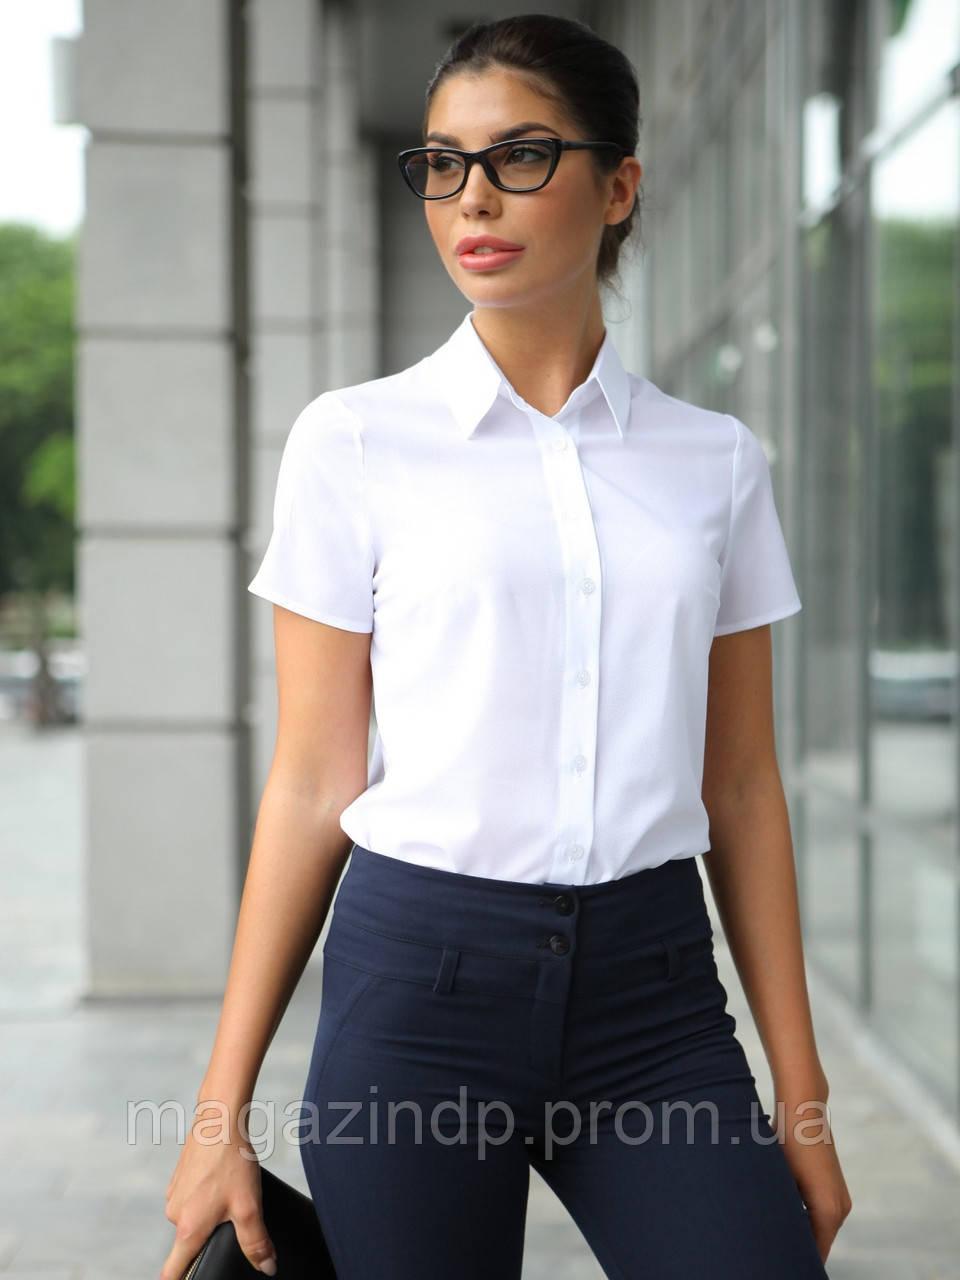 95e164b93a5 Белая блузка с коротким рукавом 4376 Код 14130 - Интернет-магазин У Фёдора в